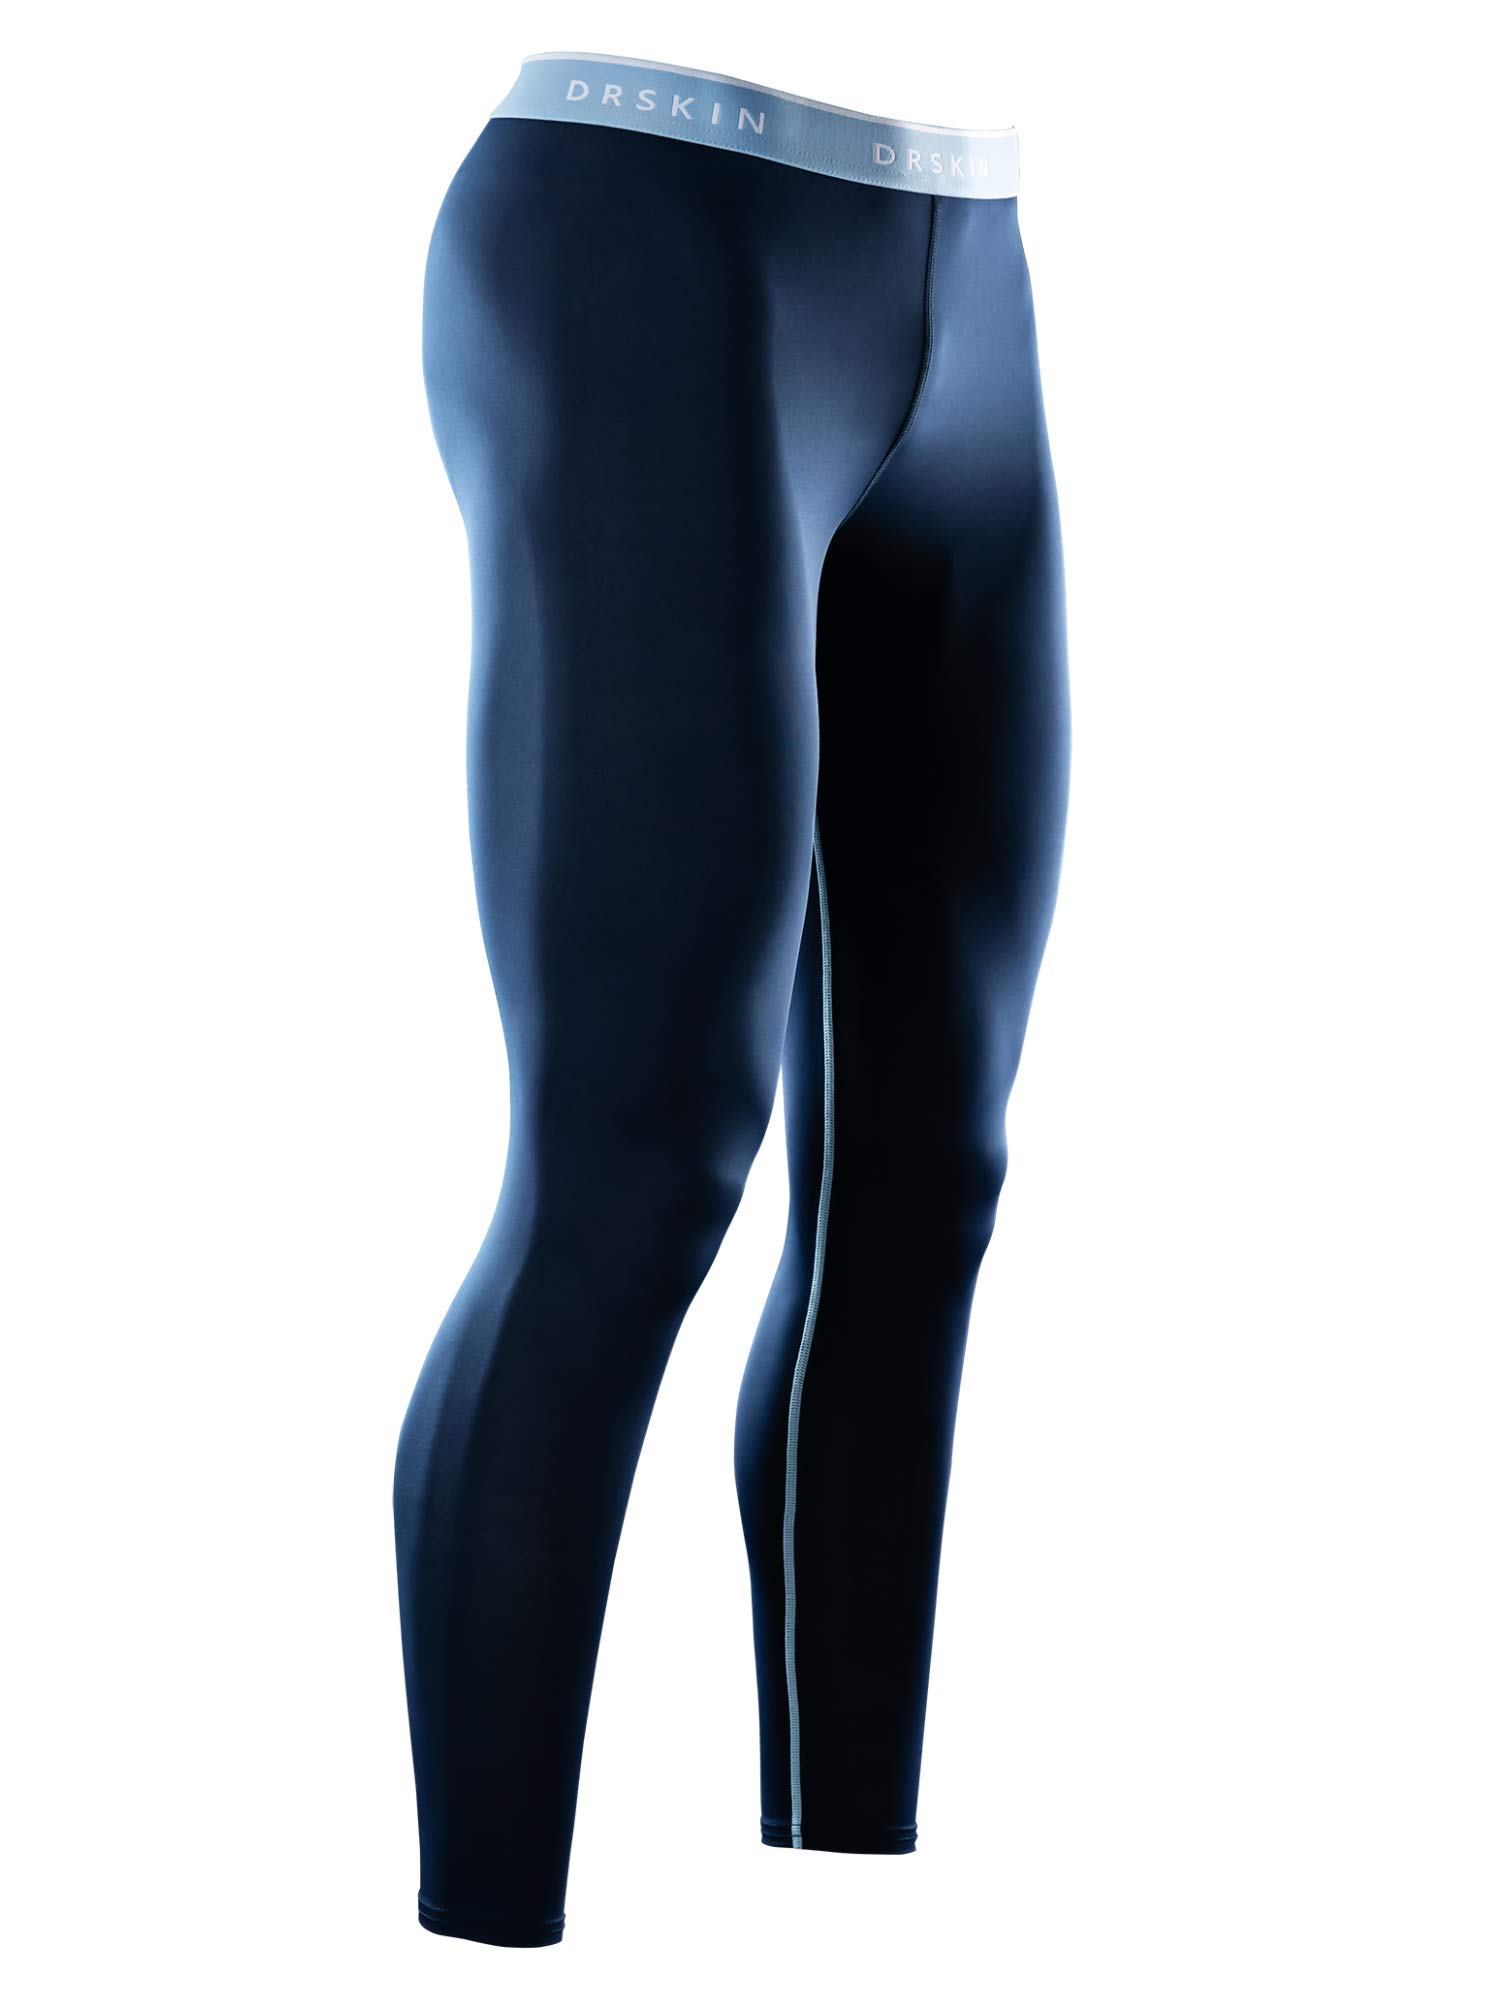 DRSKIN Compression Cool Dry Sports Tights Pants Baselayer Running Leggings Yoga Rashguard Men (Simple N02, XL) by DRSKIN